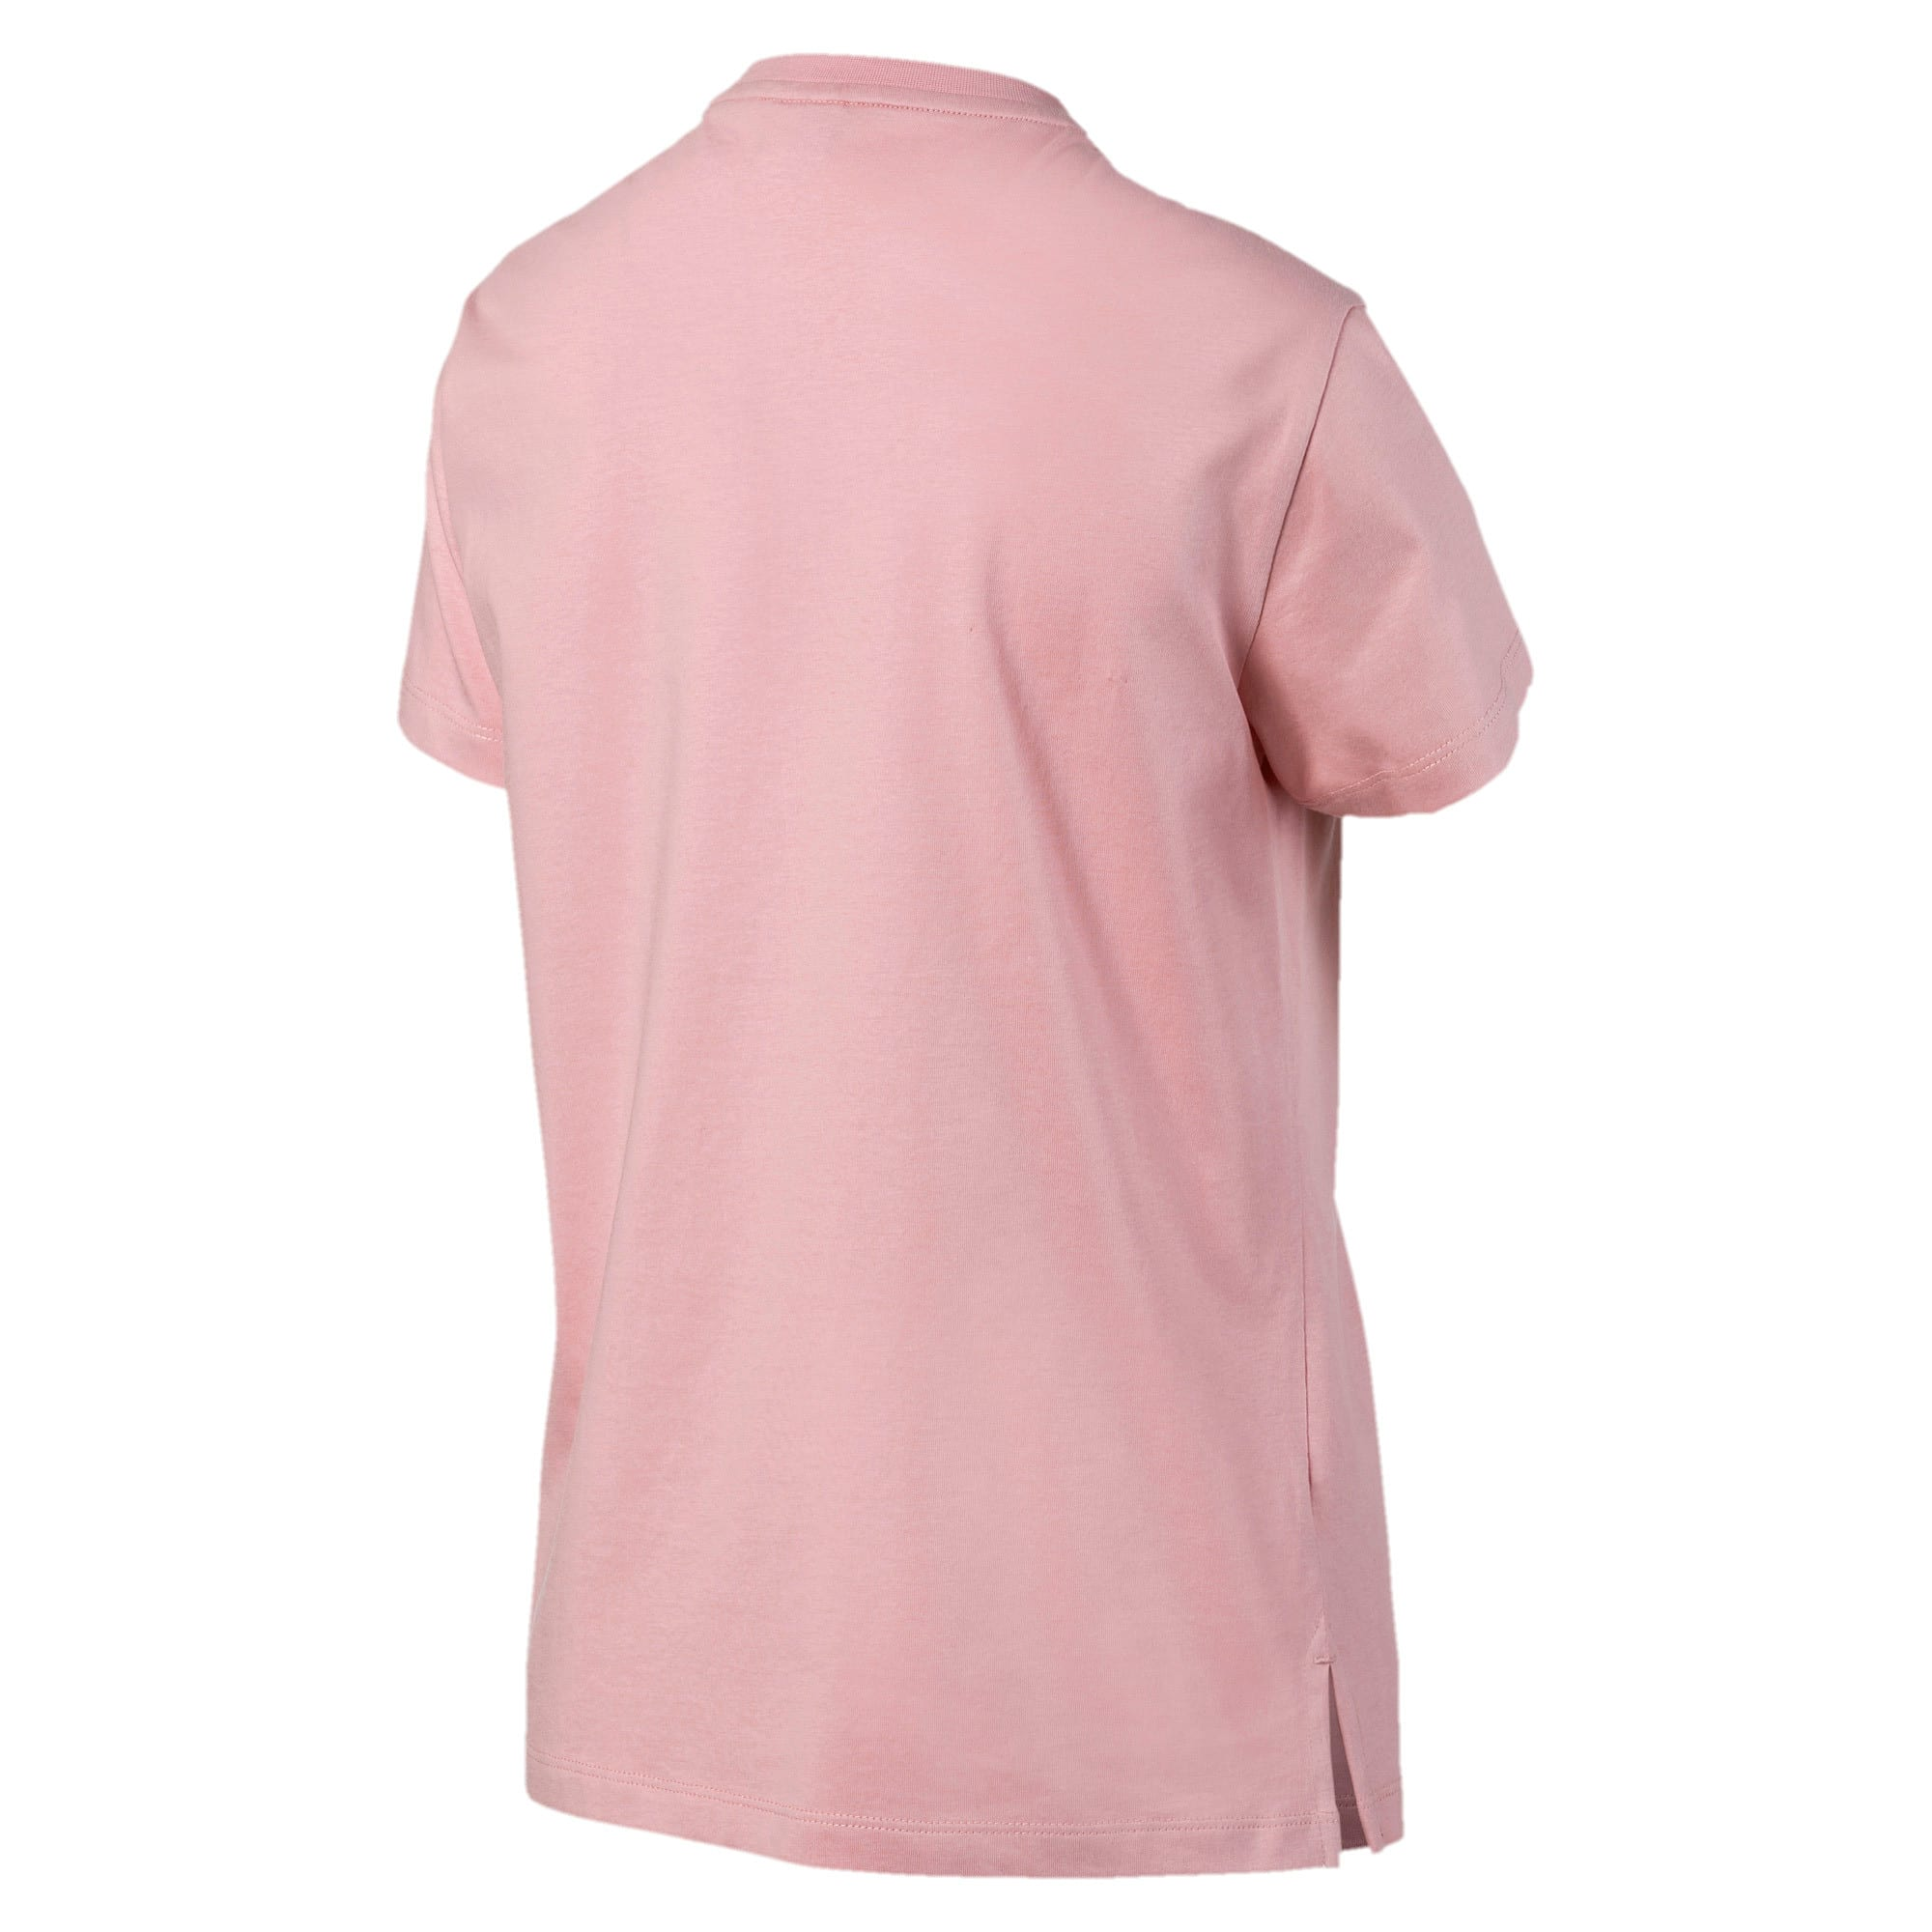 Thumbnail 5 van Classics Logo T-shirt voor vrouwen, Bruidroze, medium